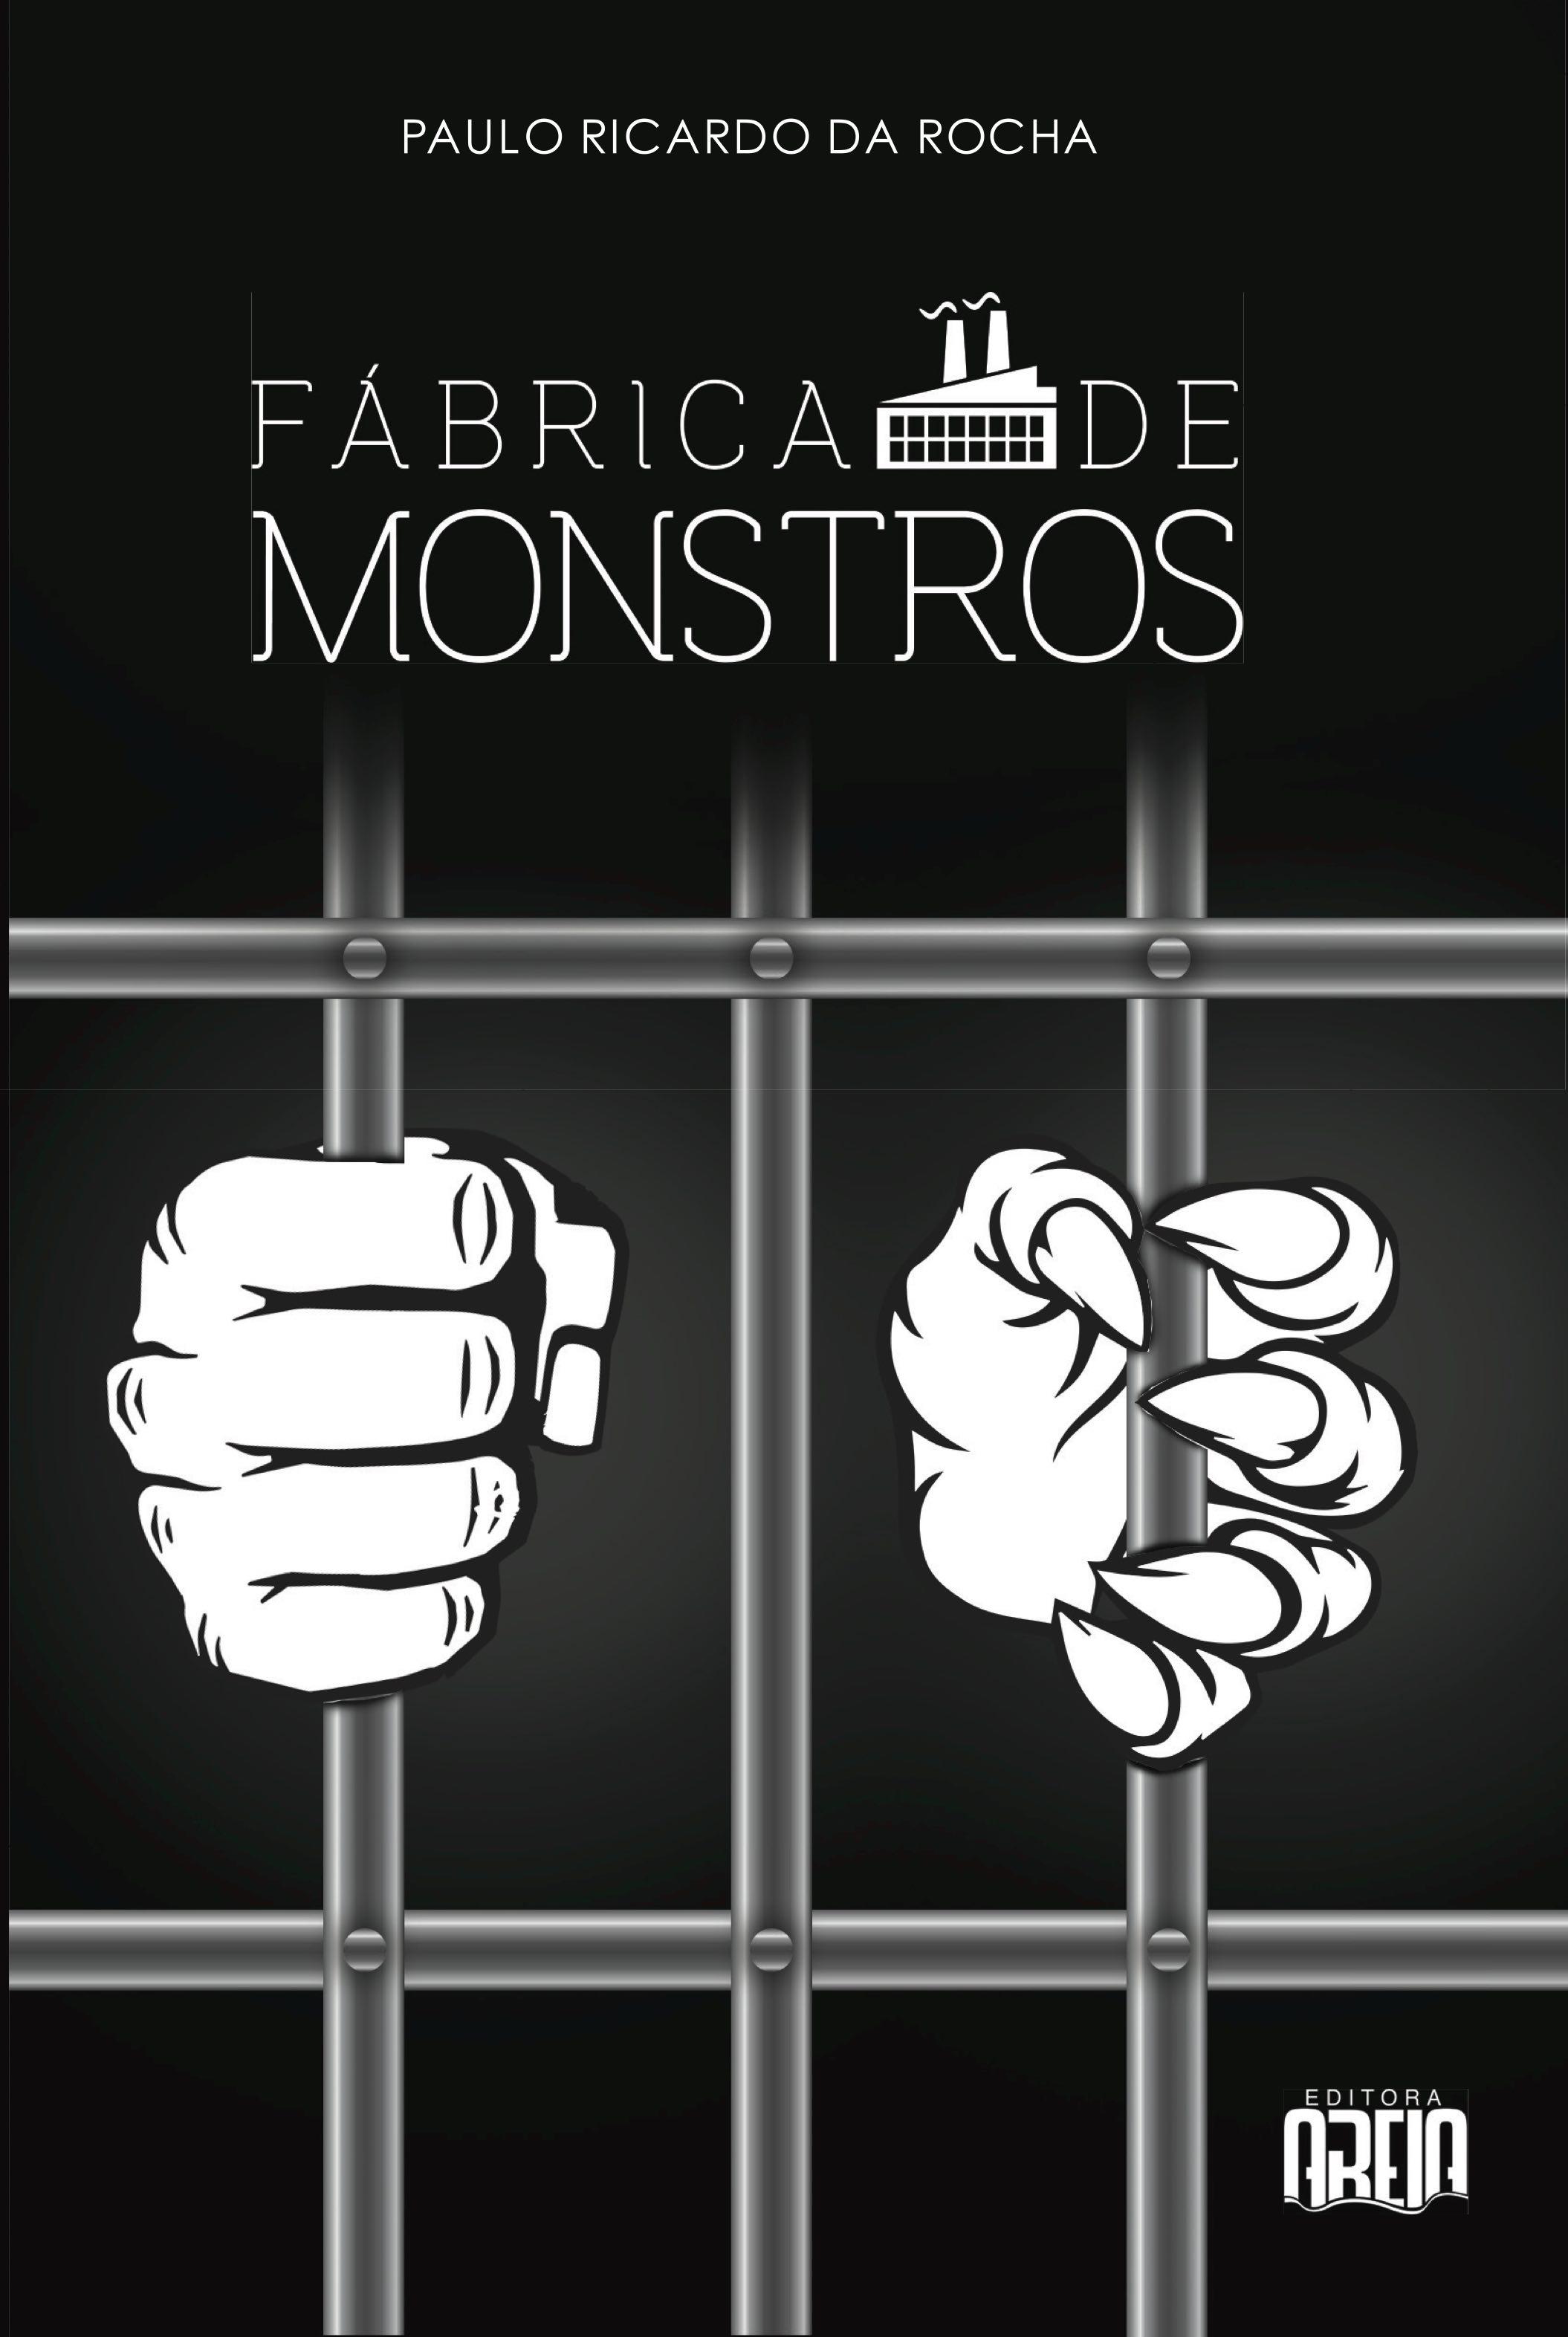 A fábrica de monstros